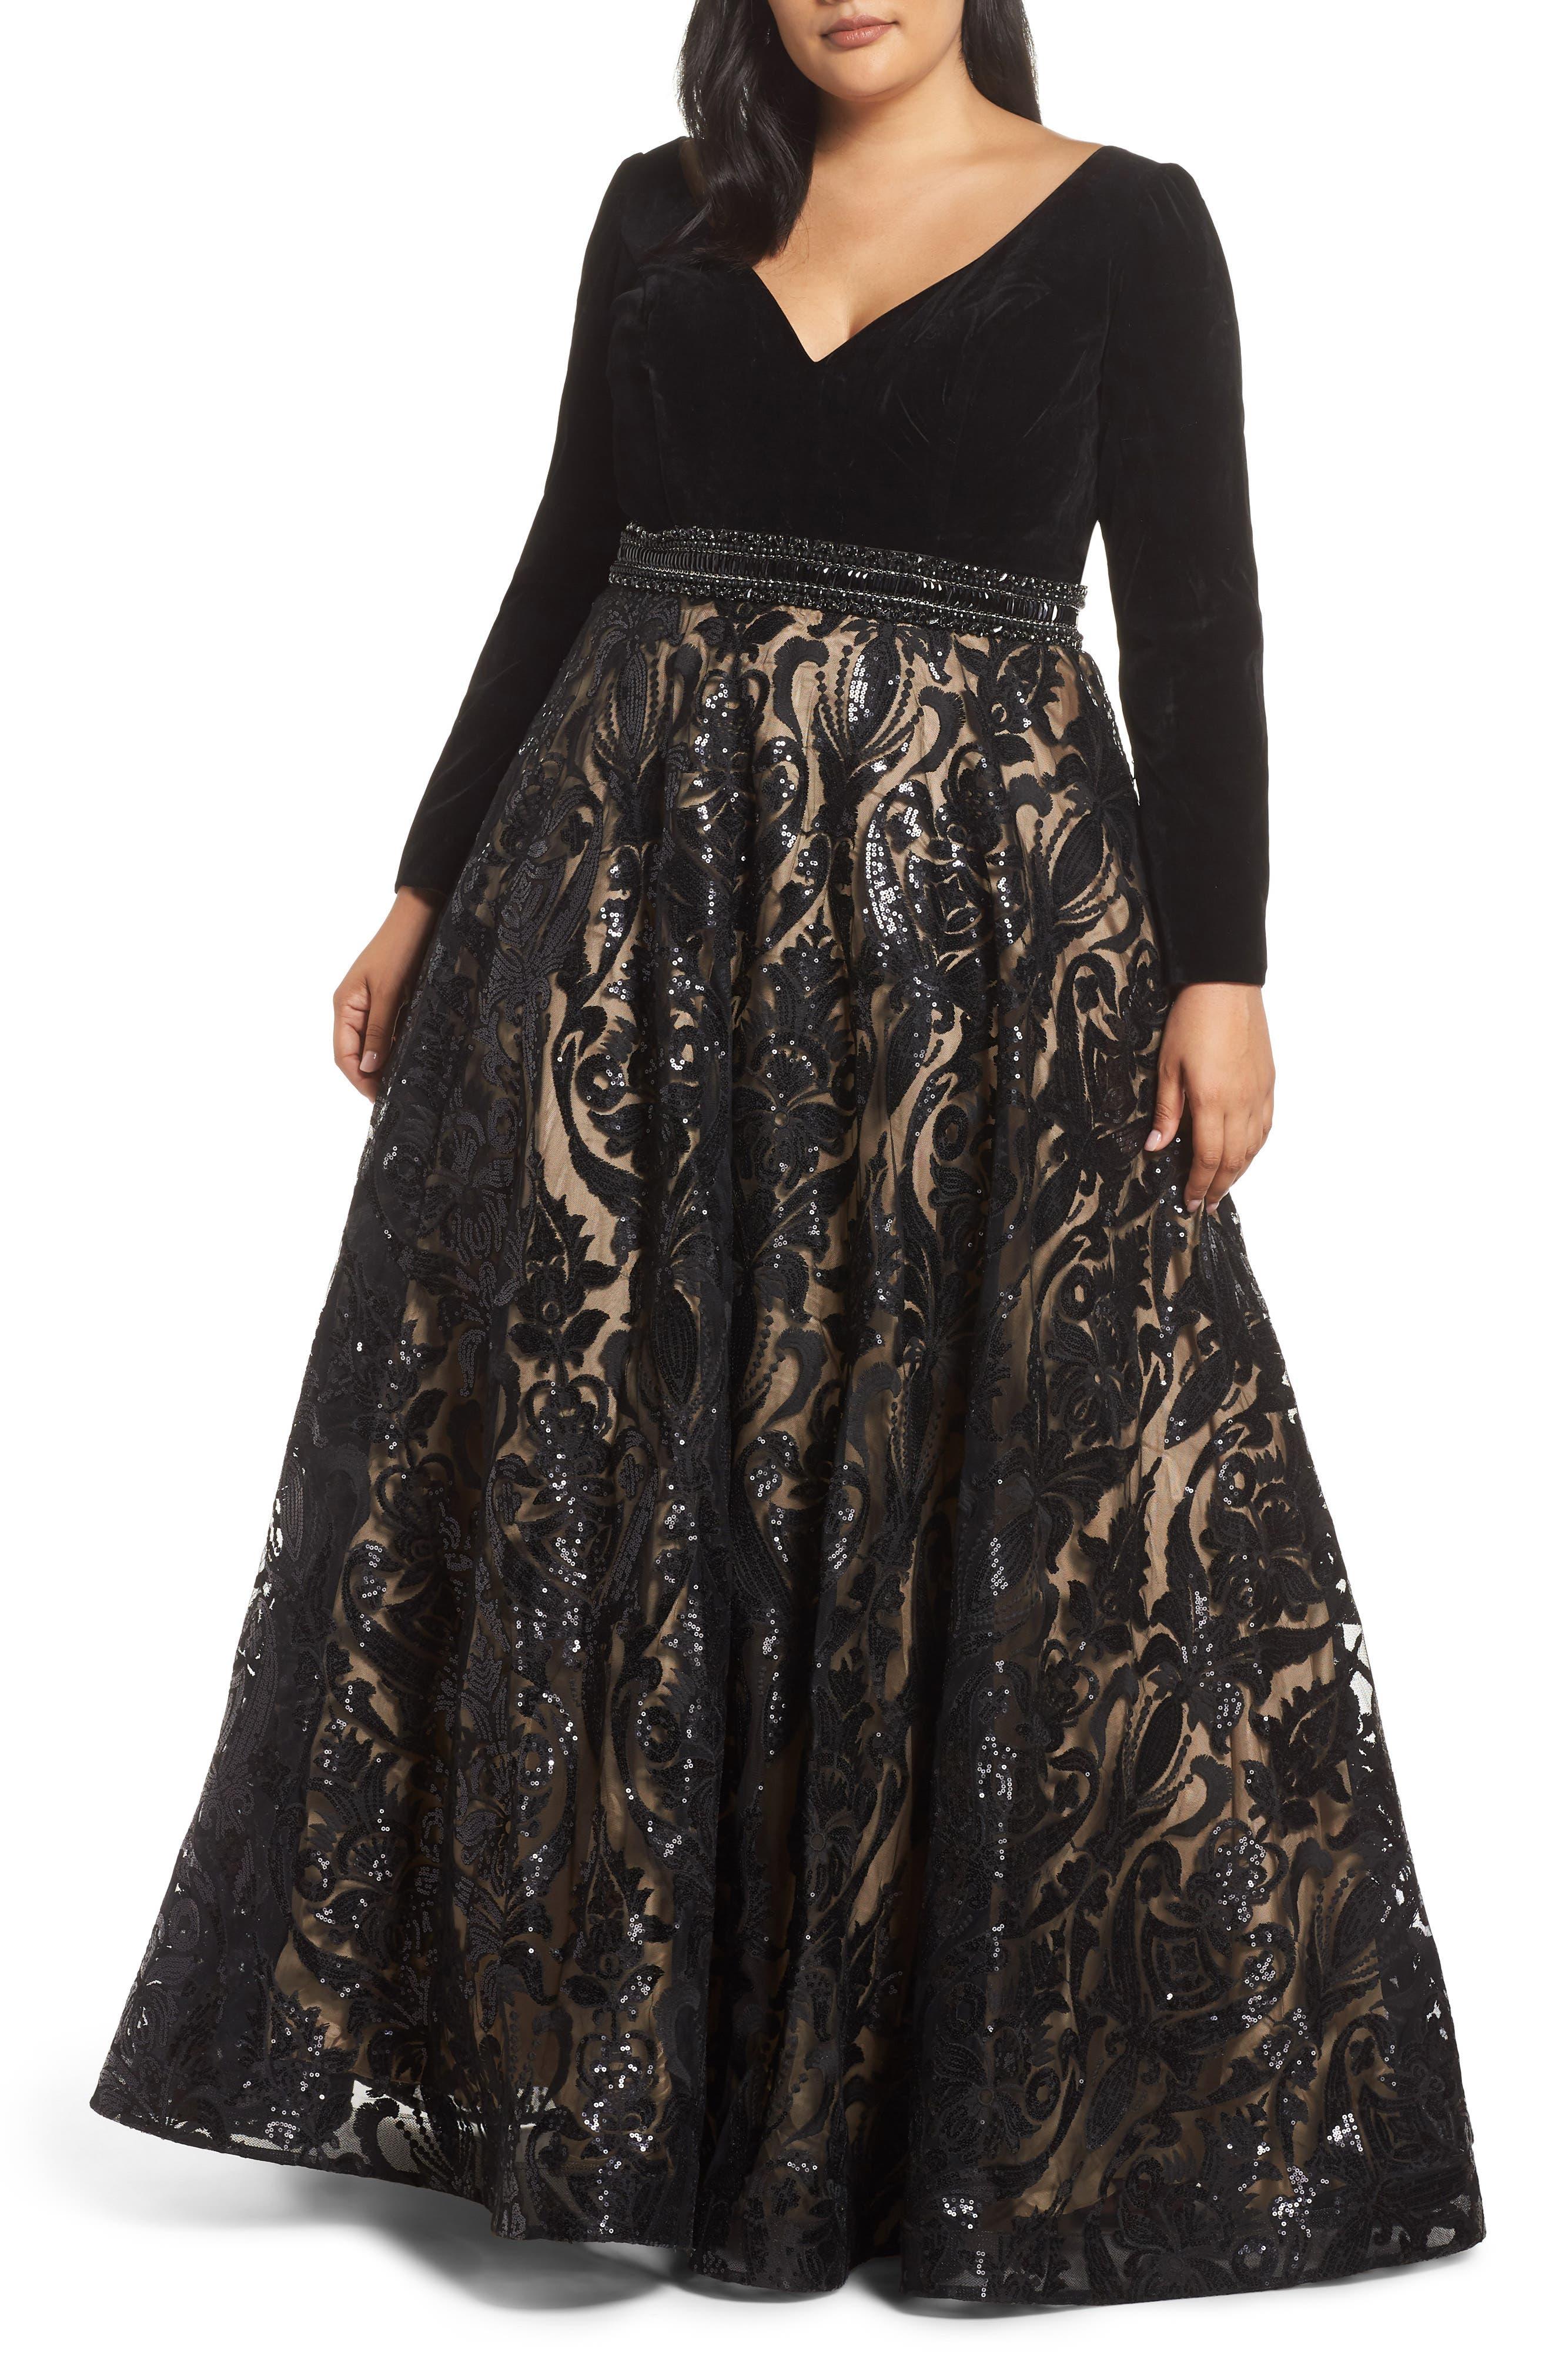 MAC DUGGAL Velvet & Sequin Jacquard Ballgown, Main, color, BLACK/ NUDE